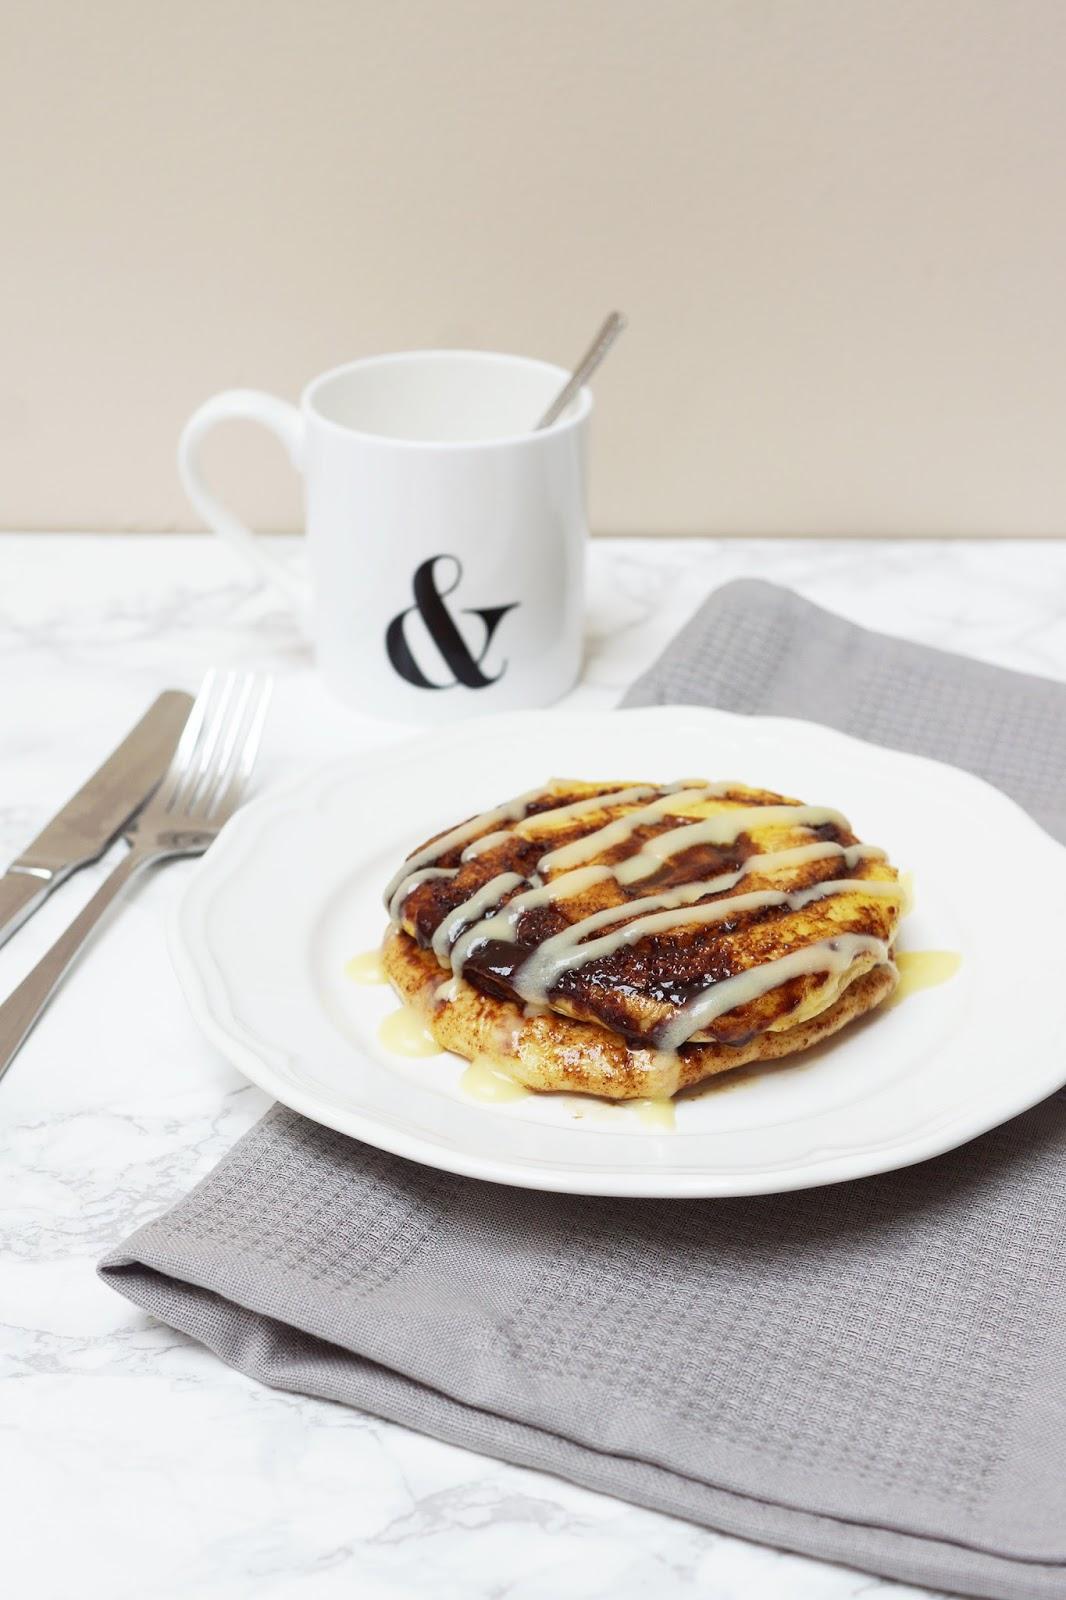 cinnamon-rolls-buns-pancakes-recipe-easy